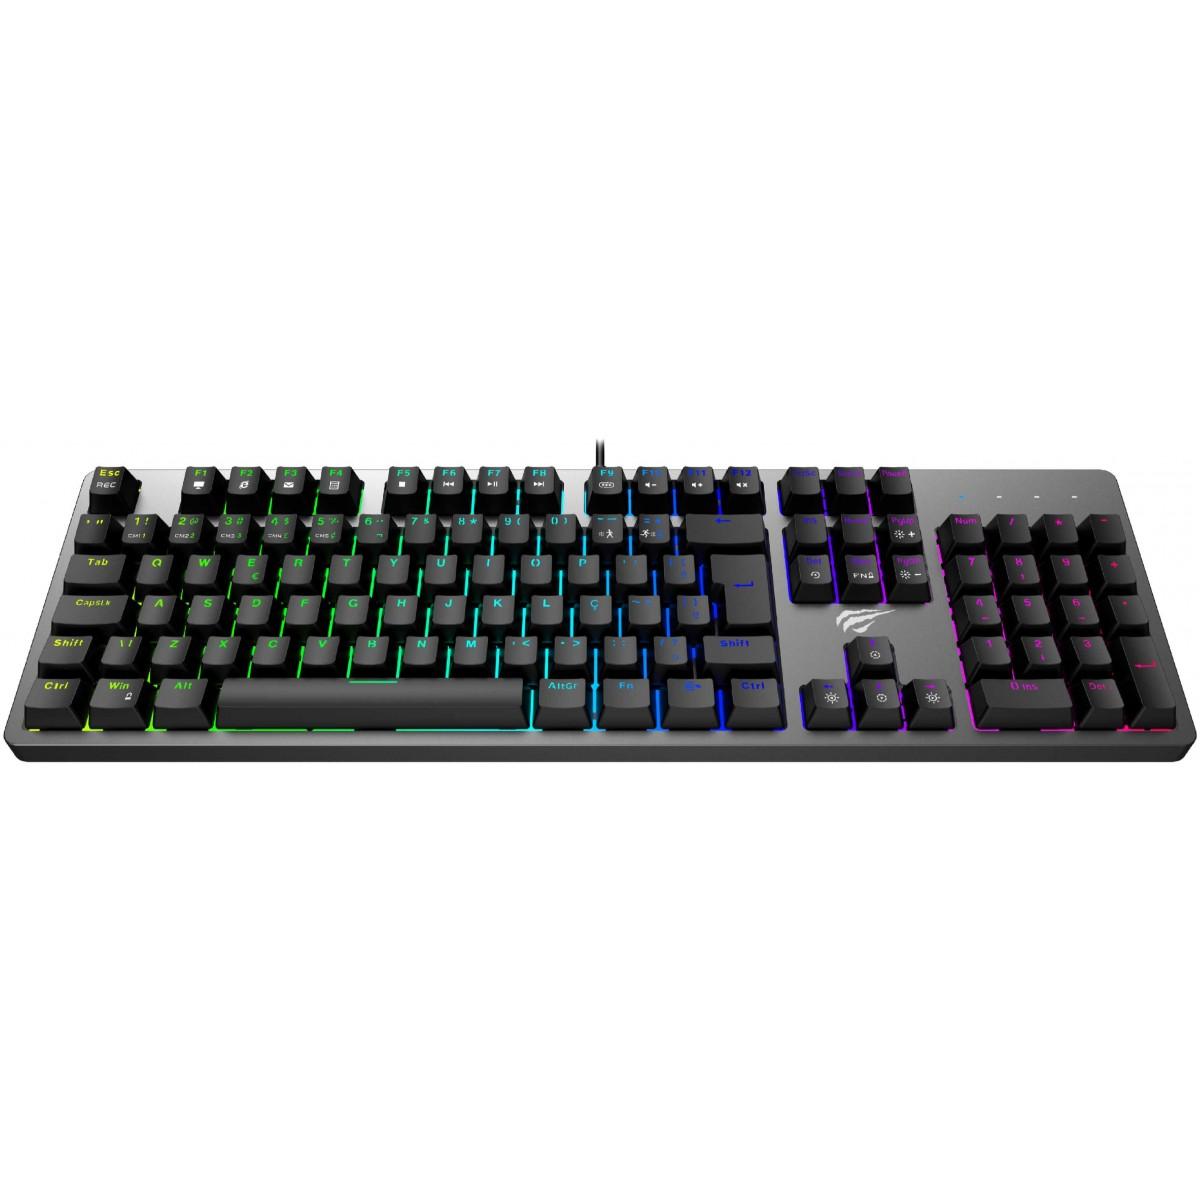 Teclado Mecânico Havit RGB, Switch Brown, ABNT-2, Black, KB492L